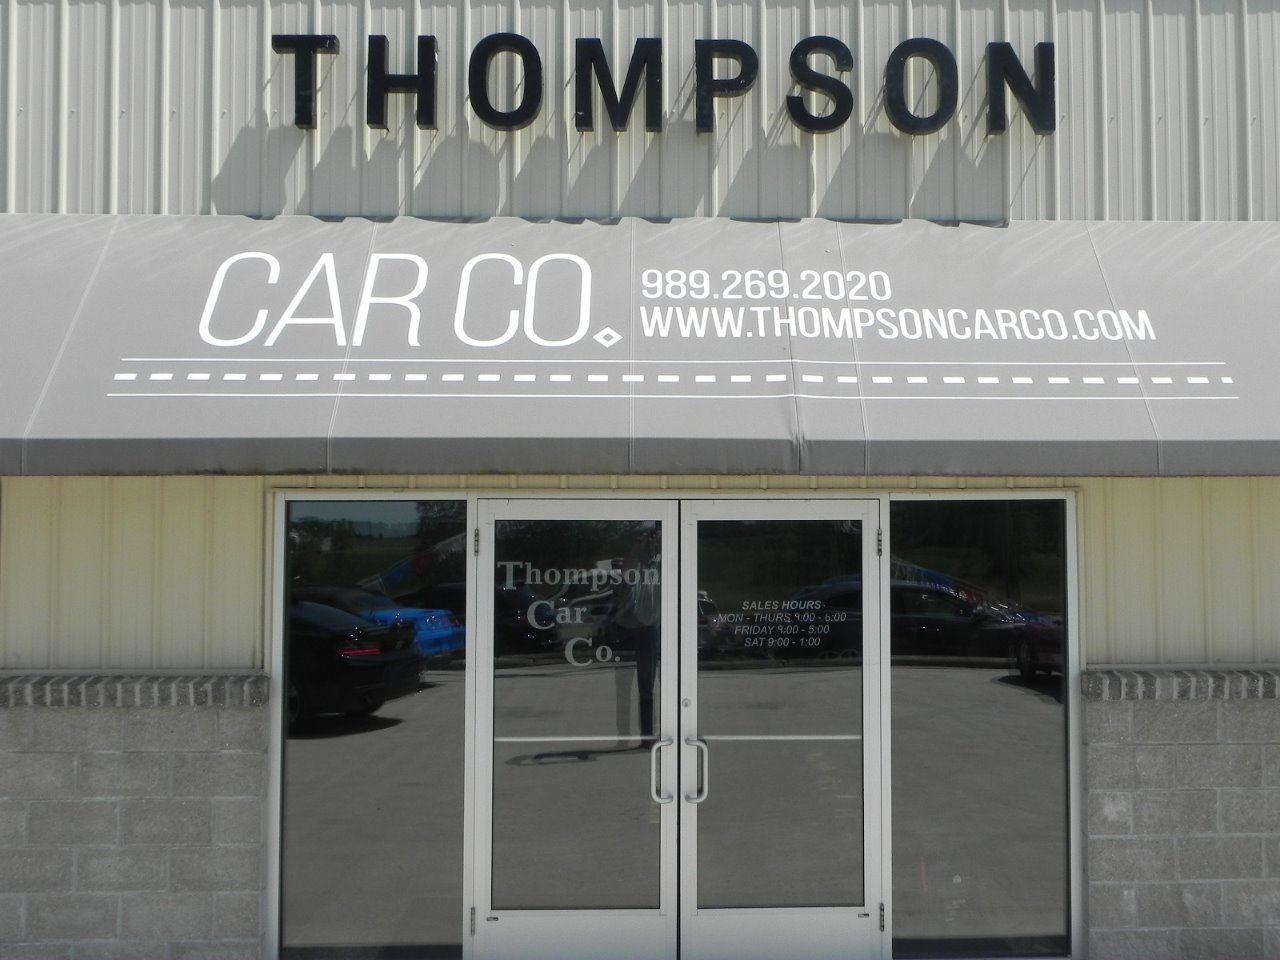 Thompson Car Company